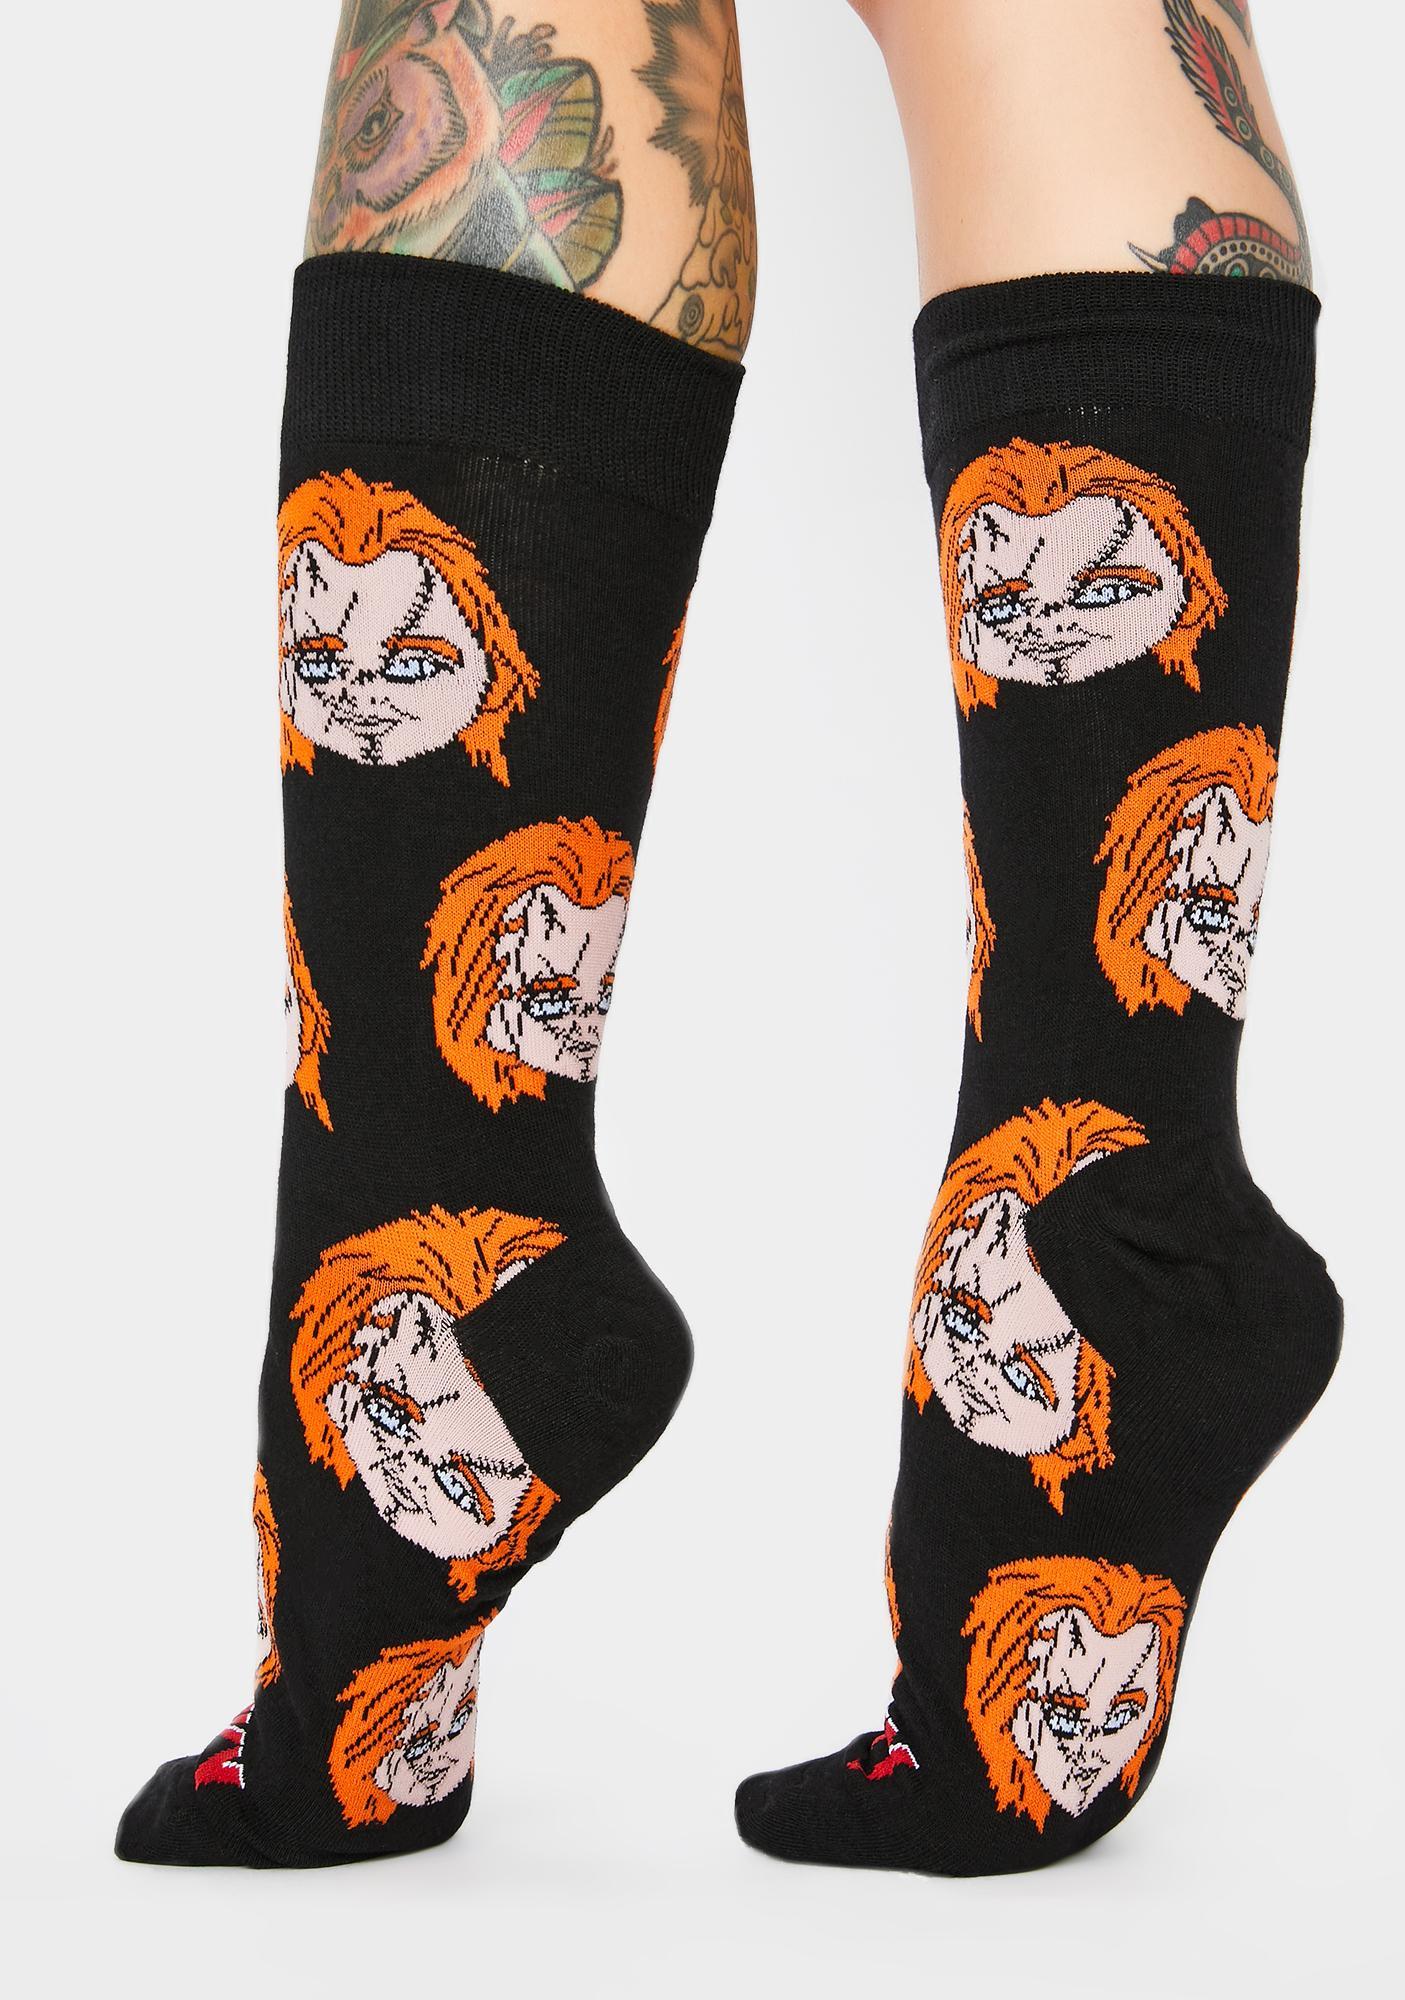 Cool Socks Chucky Heads Crew Socks